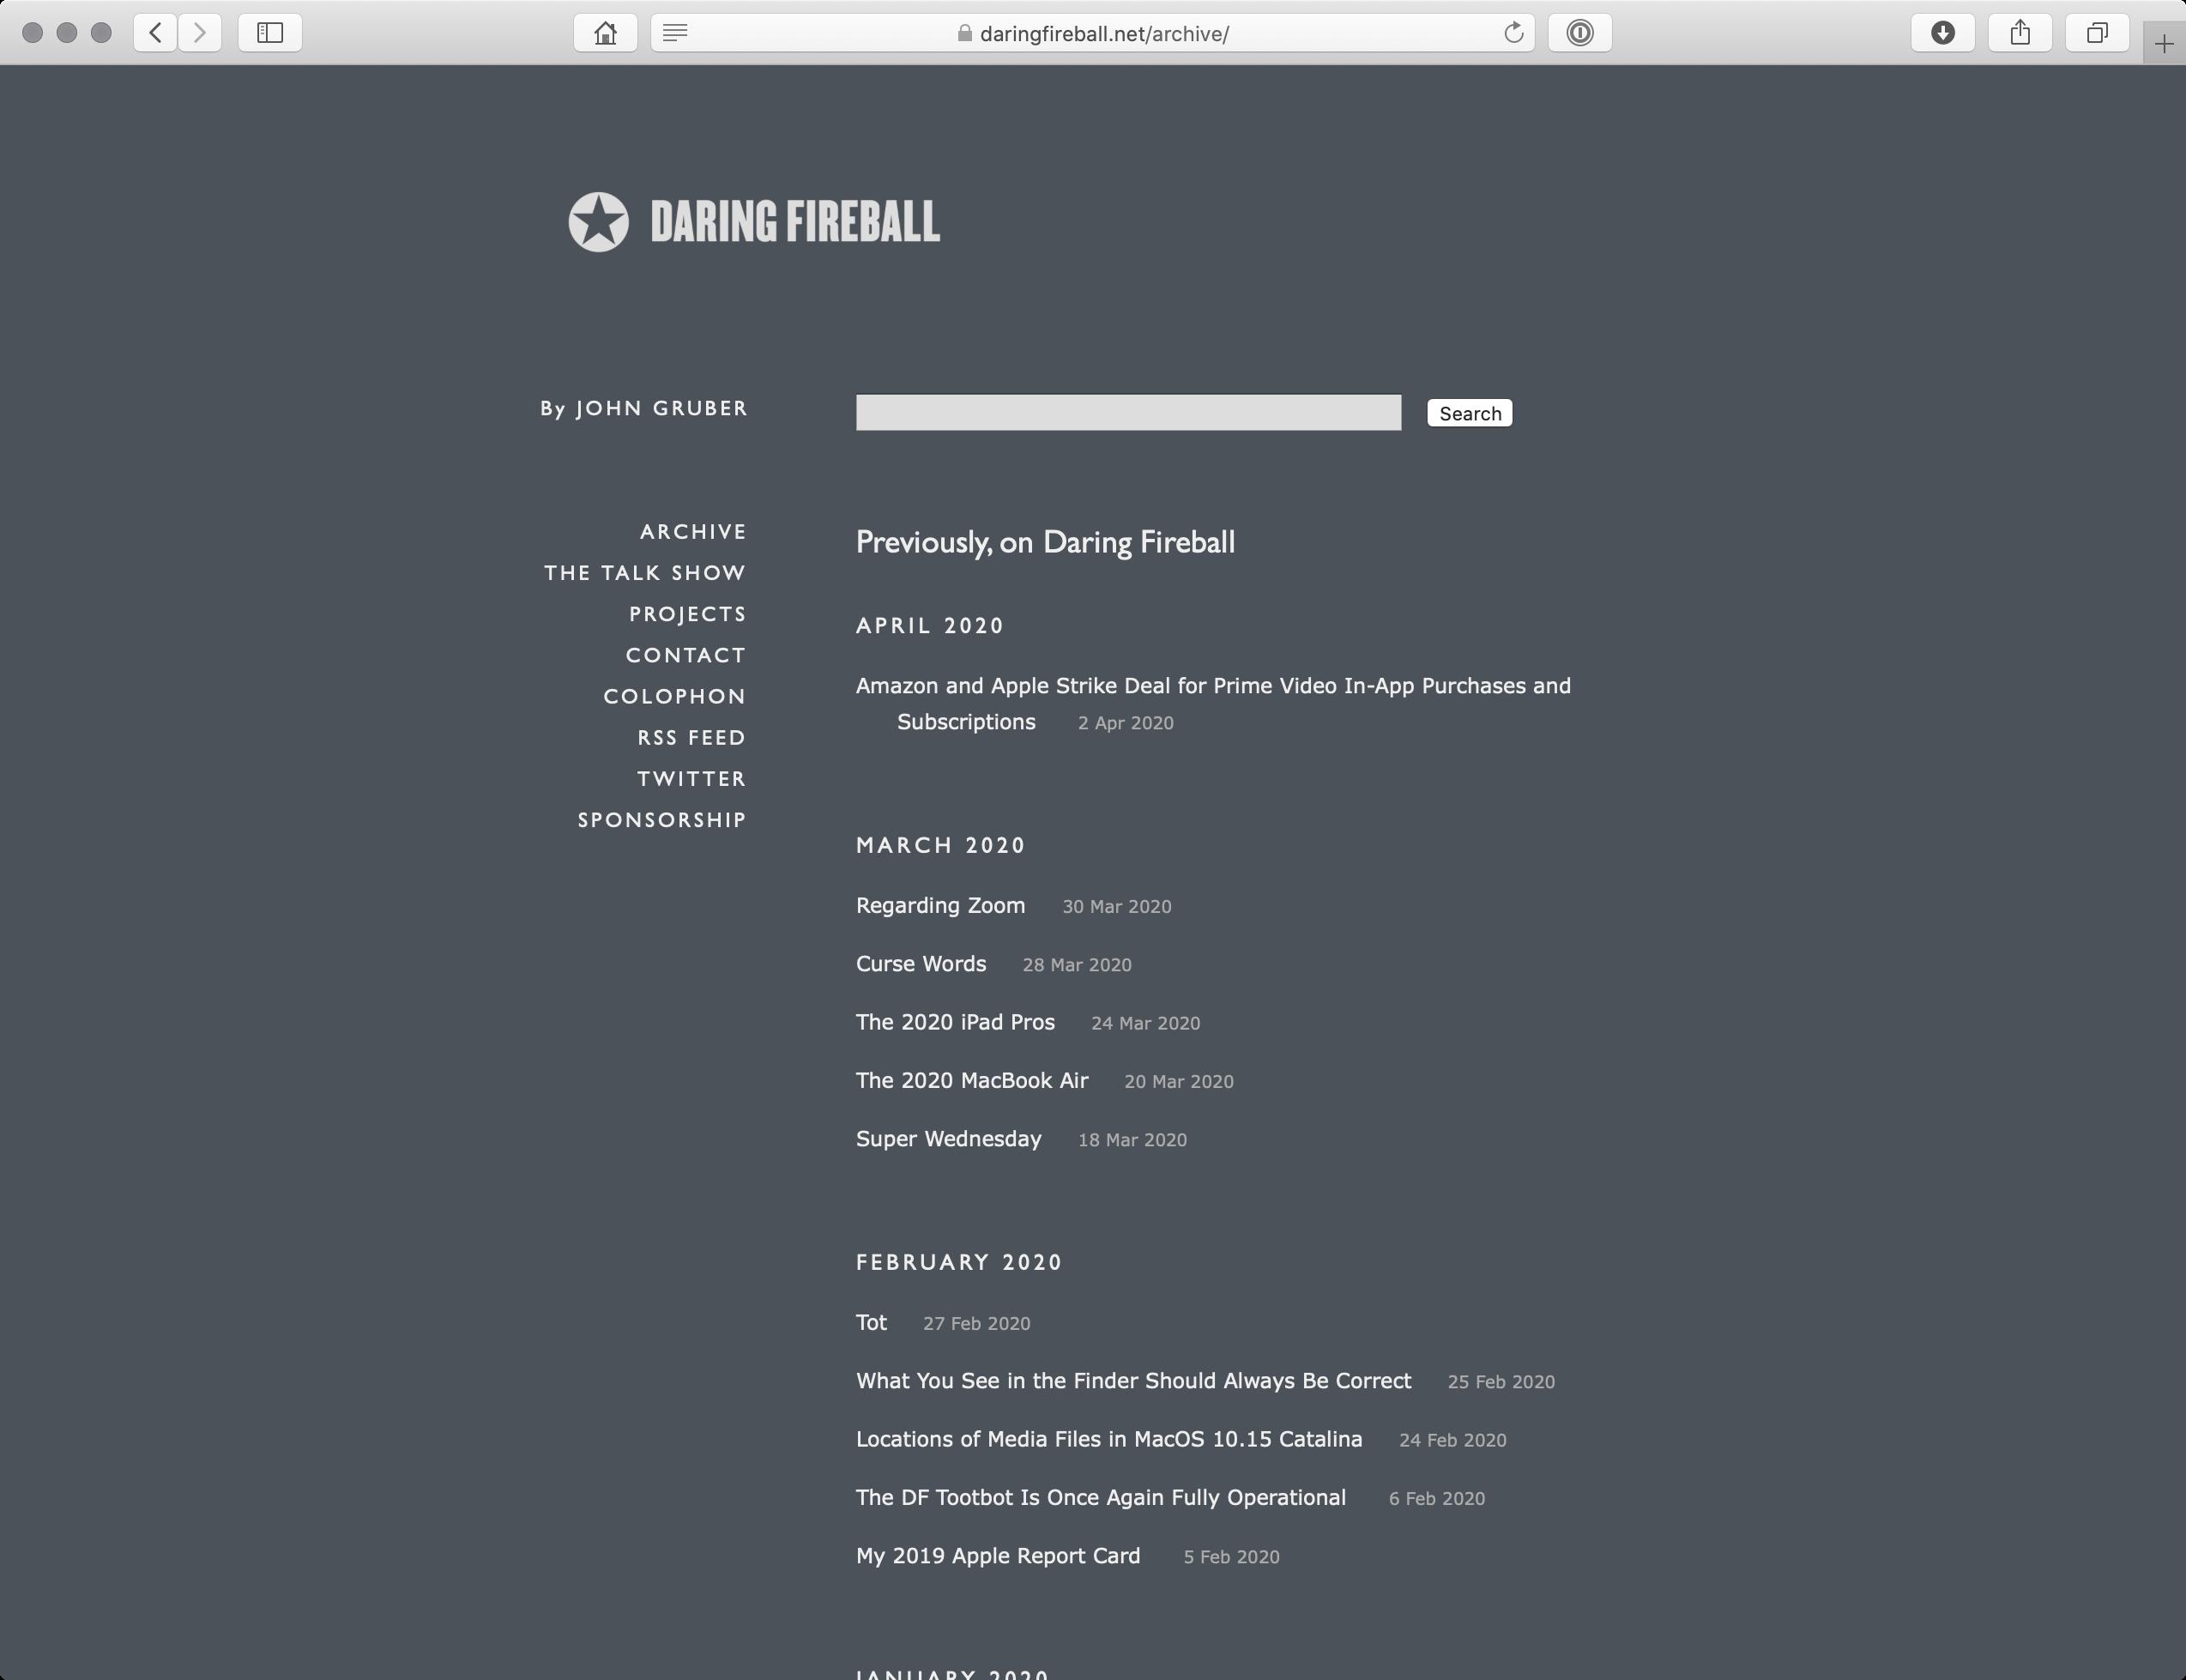 Daring Fireball: Archive